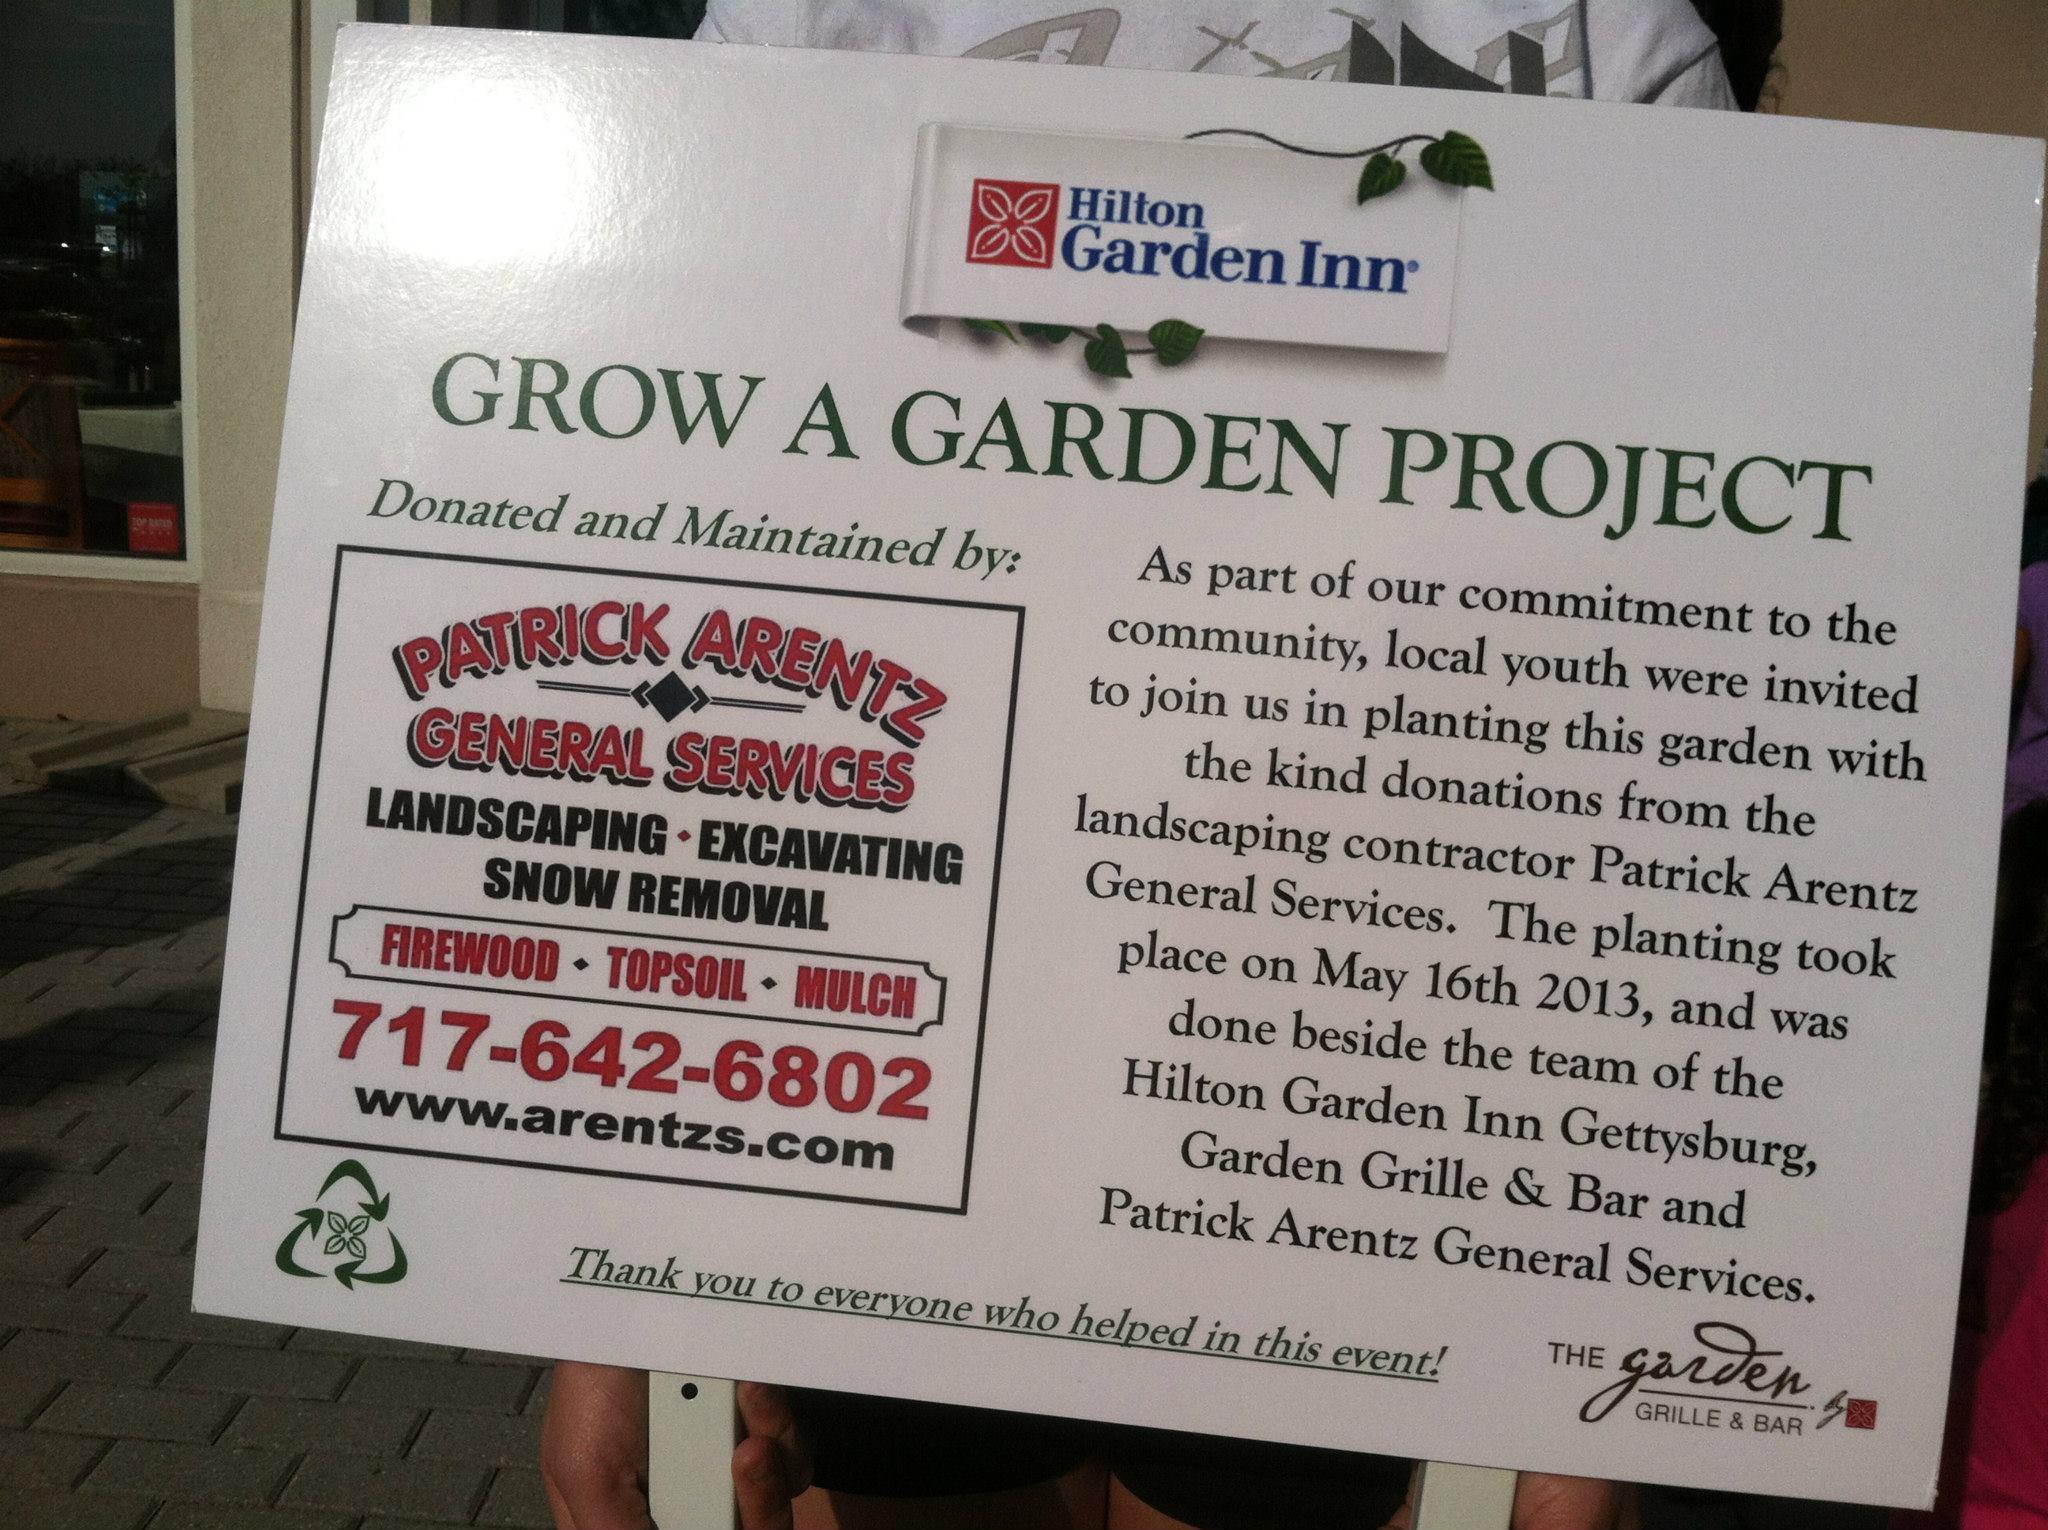 Grow a Garden Project